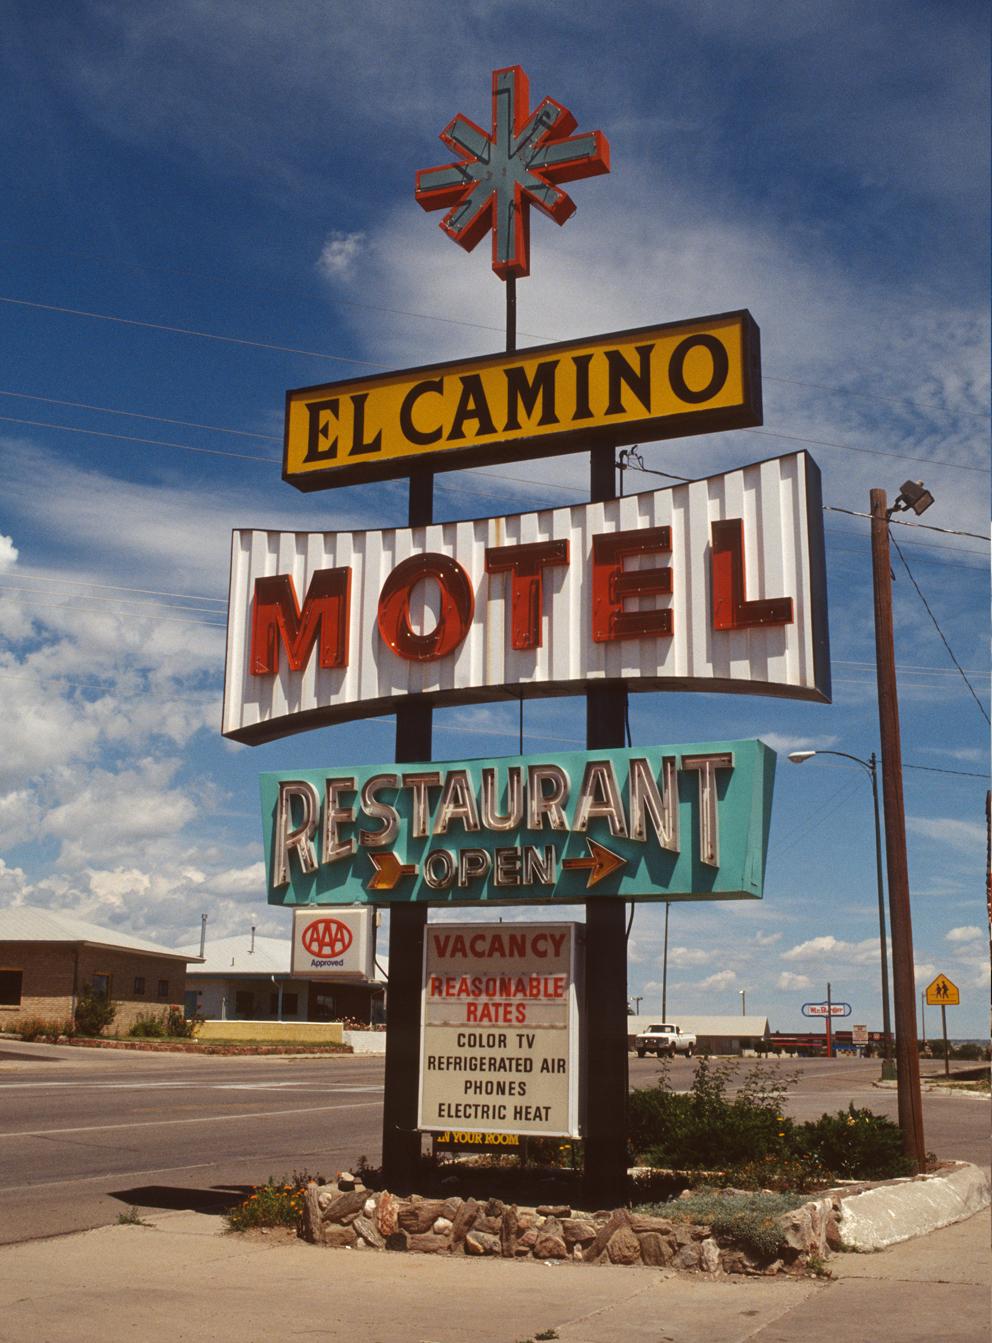 El Camino Motel, photographed in New Mexico